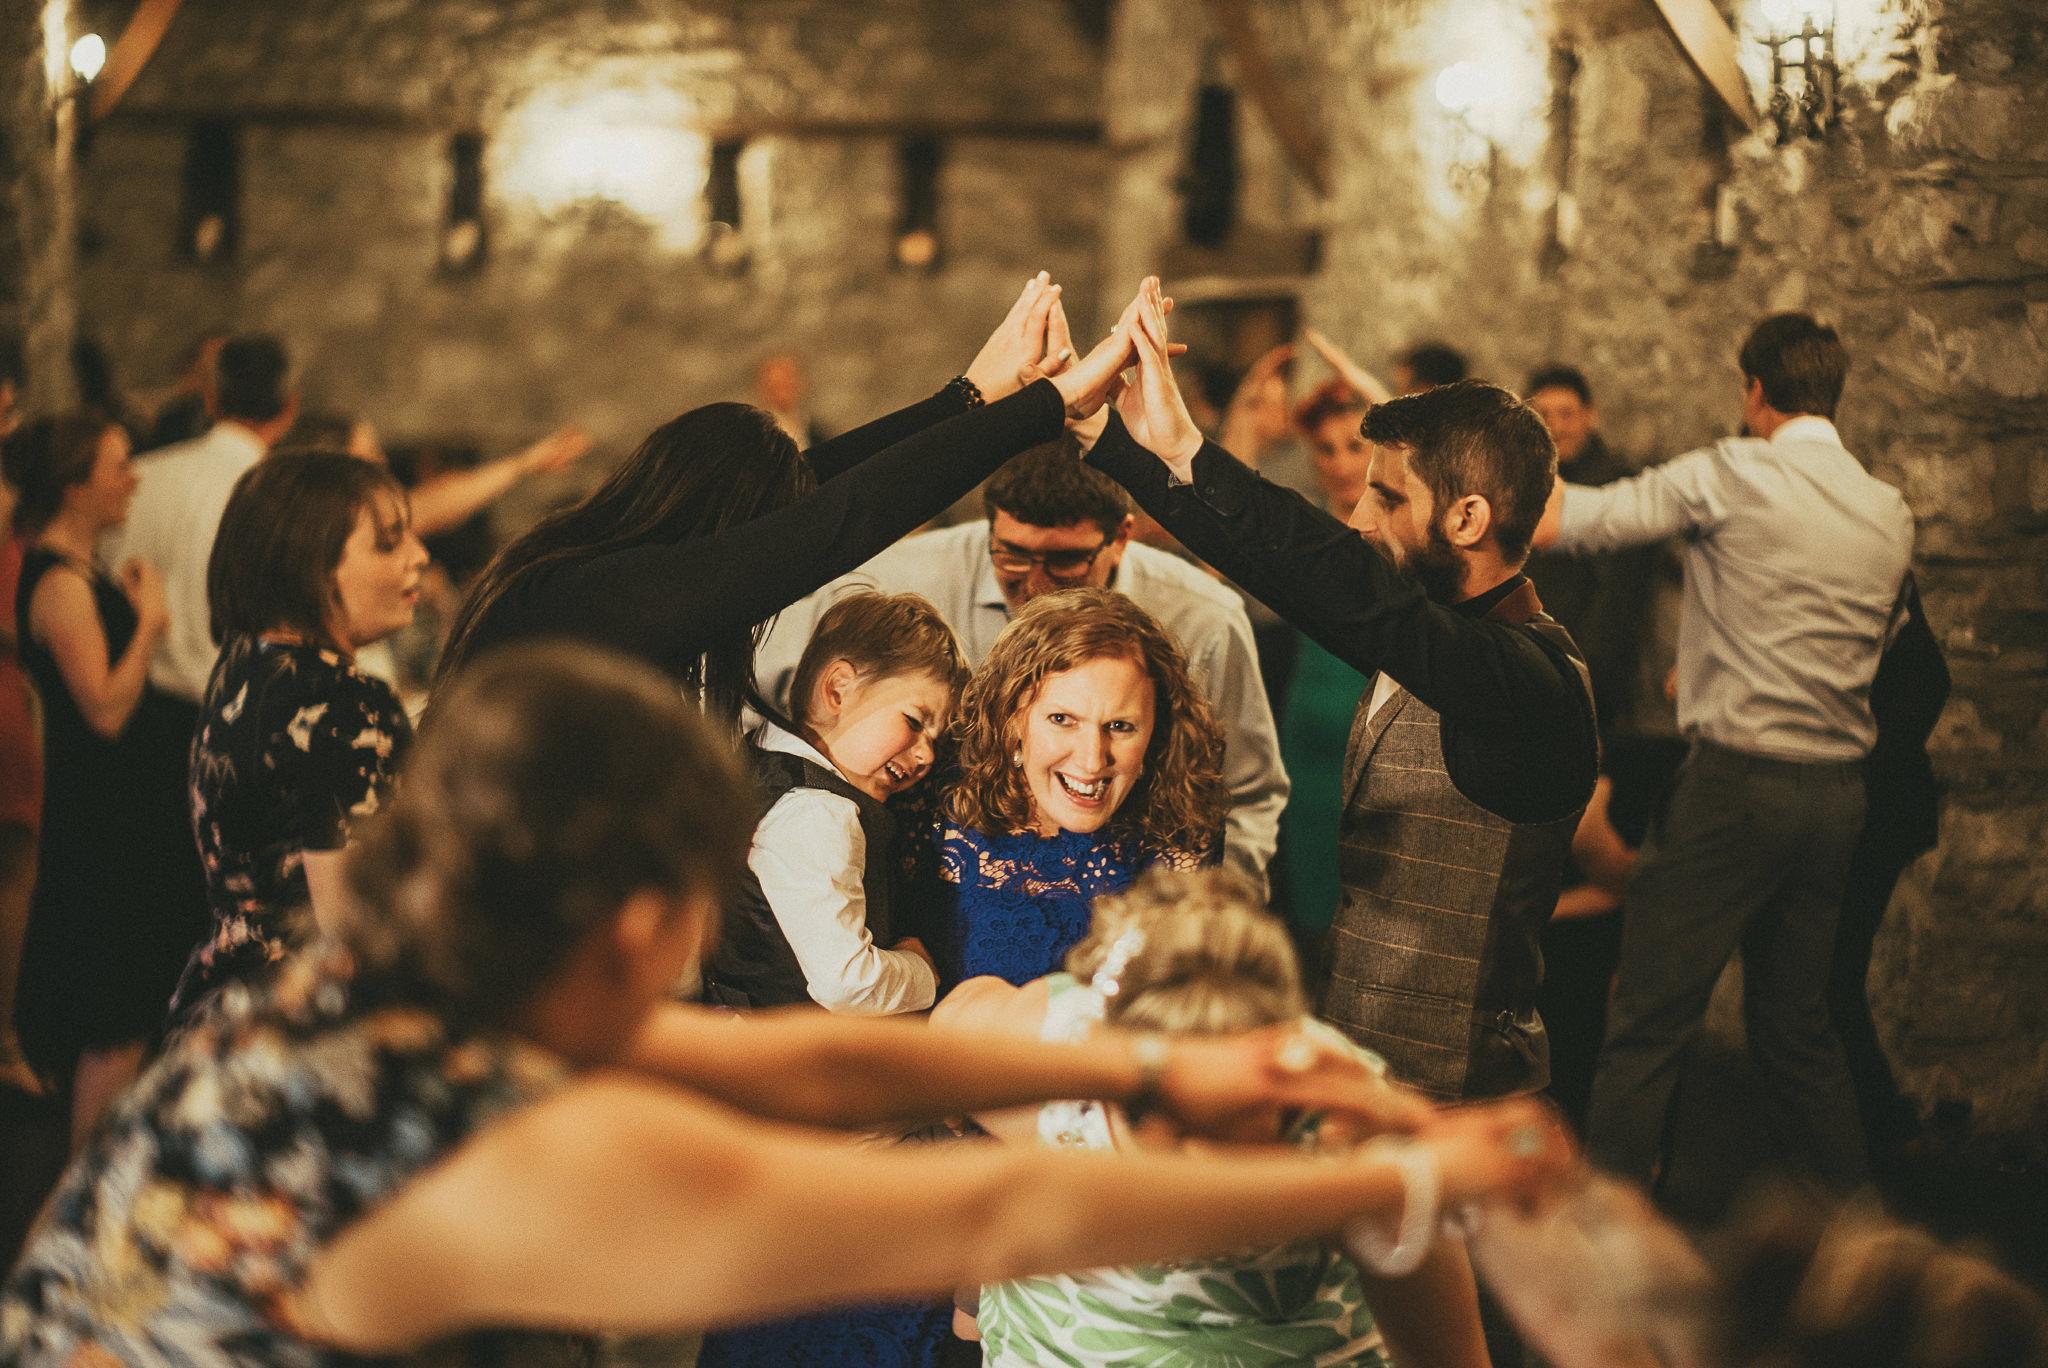 plas-isaf-corwen-north wales wedding-photography-photographer-91098